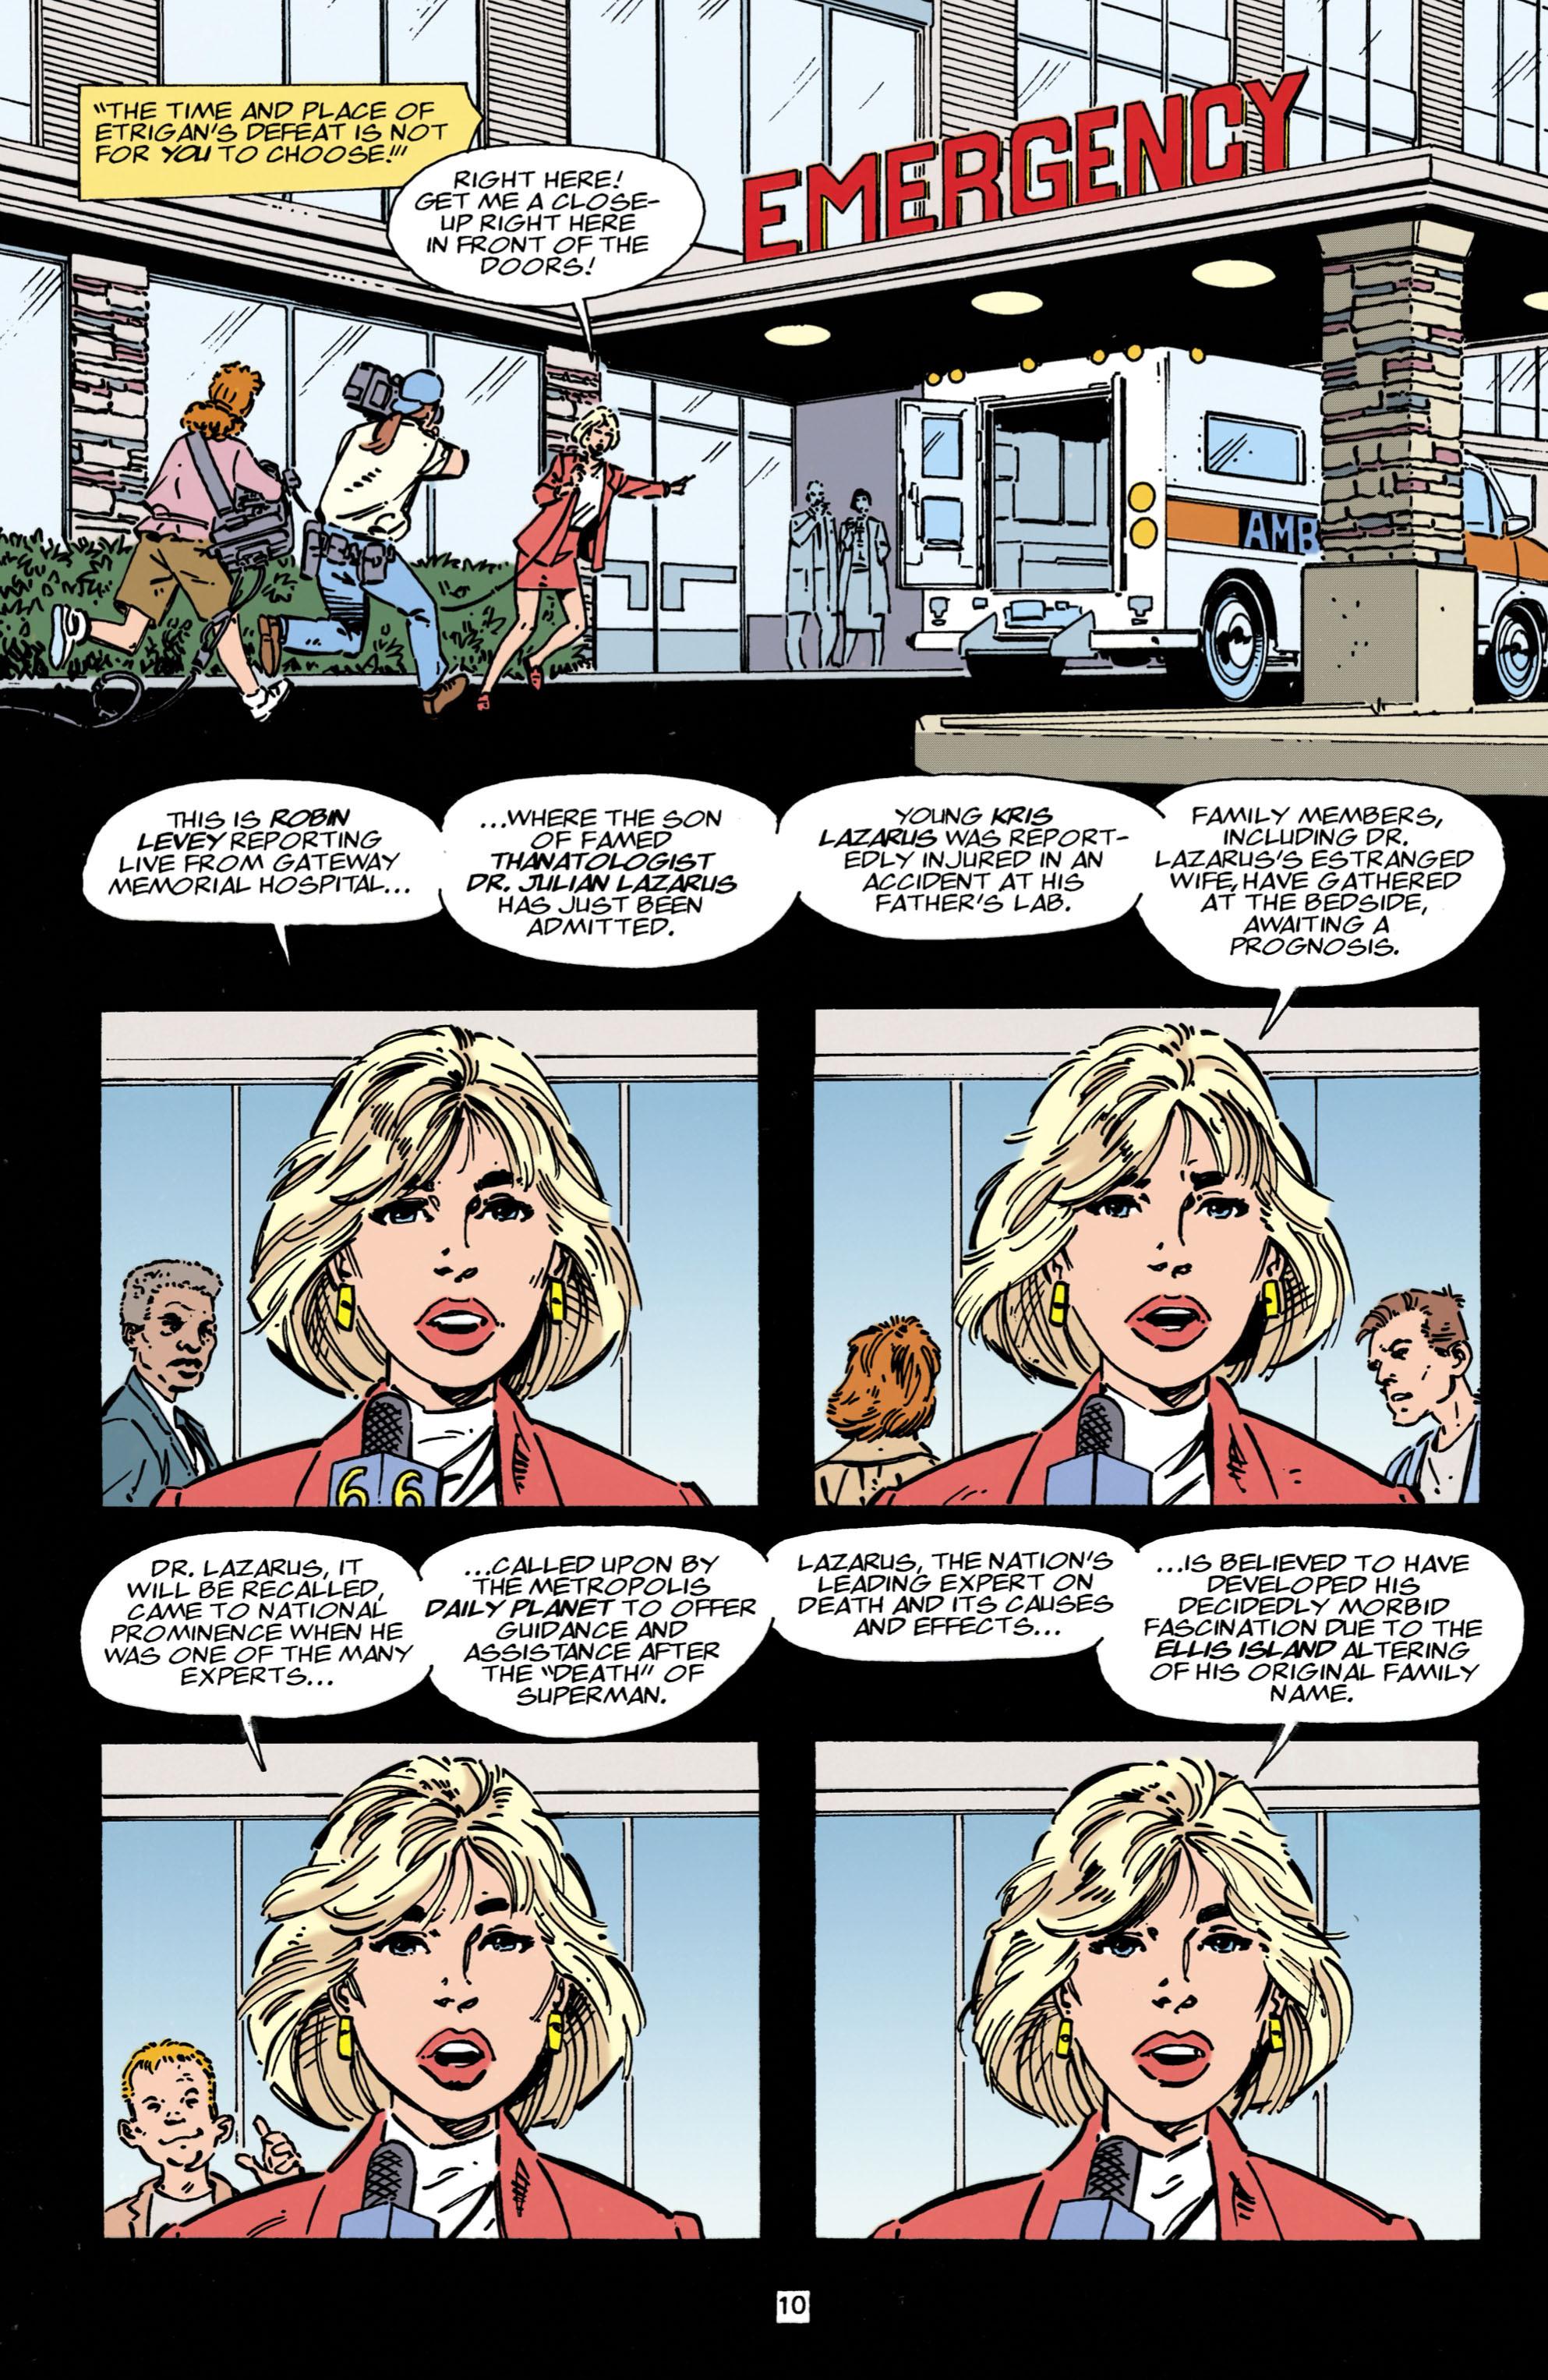 Read online Wonder Woman (1987) comic -  Issue #107 - 10